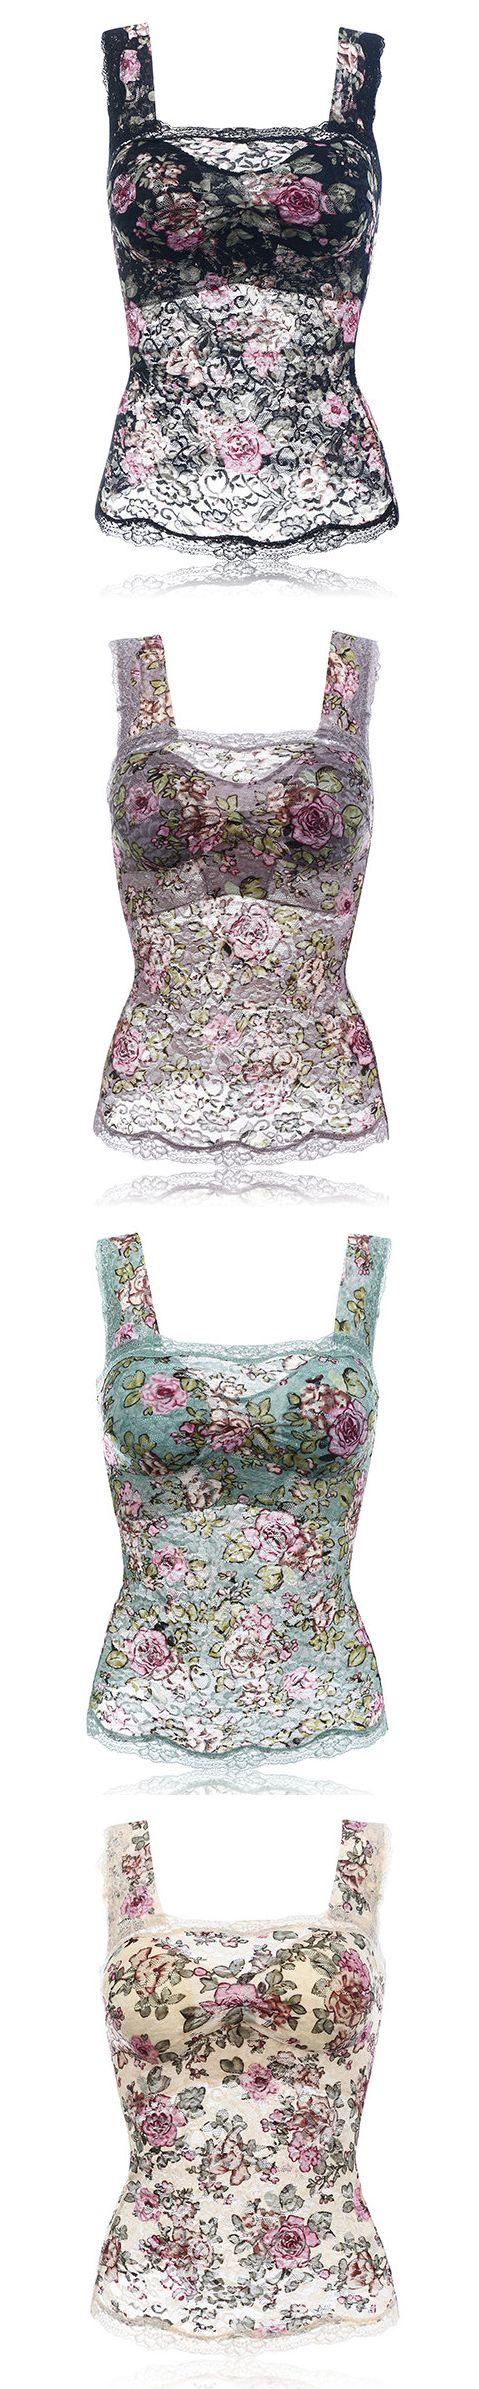 $ 16.96  Sexy Lace Hem No Rims Vest Bras Comfortable Floral Tank Top Bra